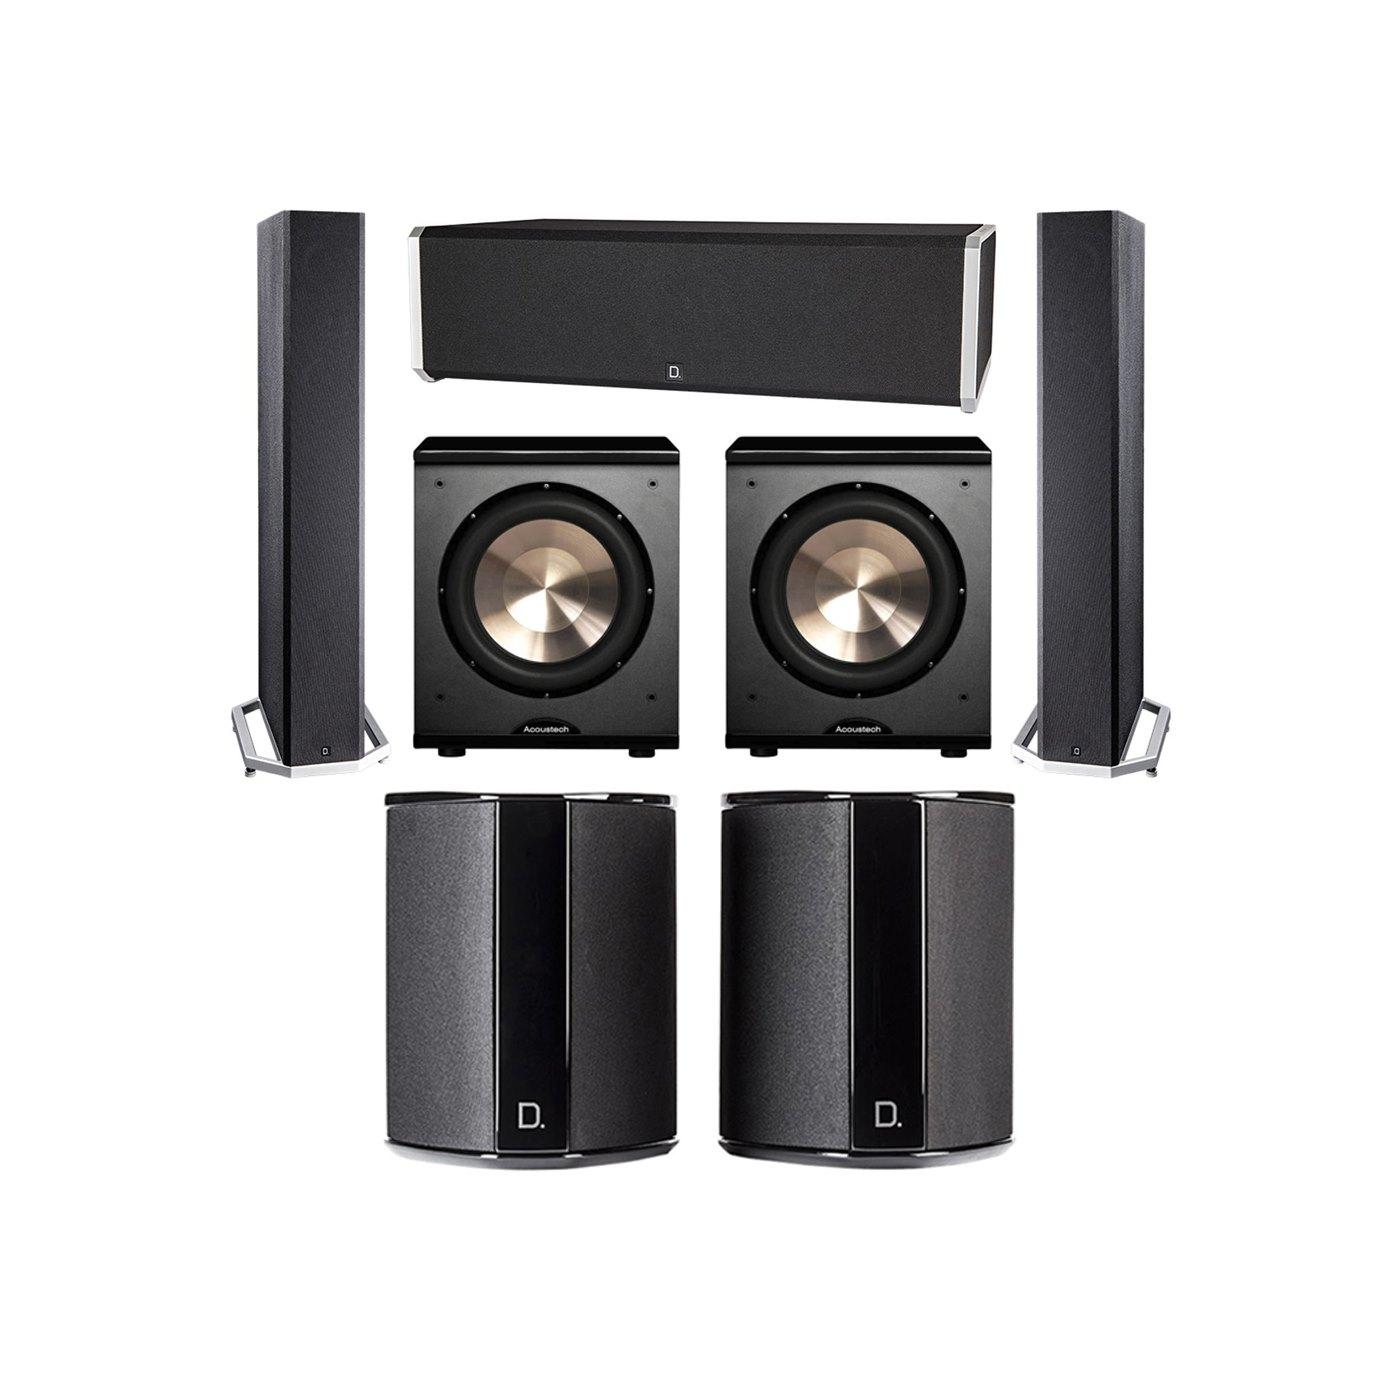 Definitive Technology 5.2 System with 2 BP9040 Tower Speakers, 1 CS9040 Center Channel Speaker, 2 SR9040 Surround Speaker, 2 BIC PL-200 Subwoofer